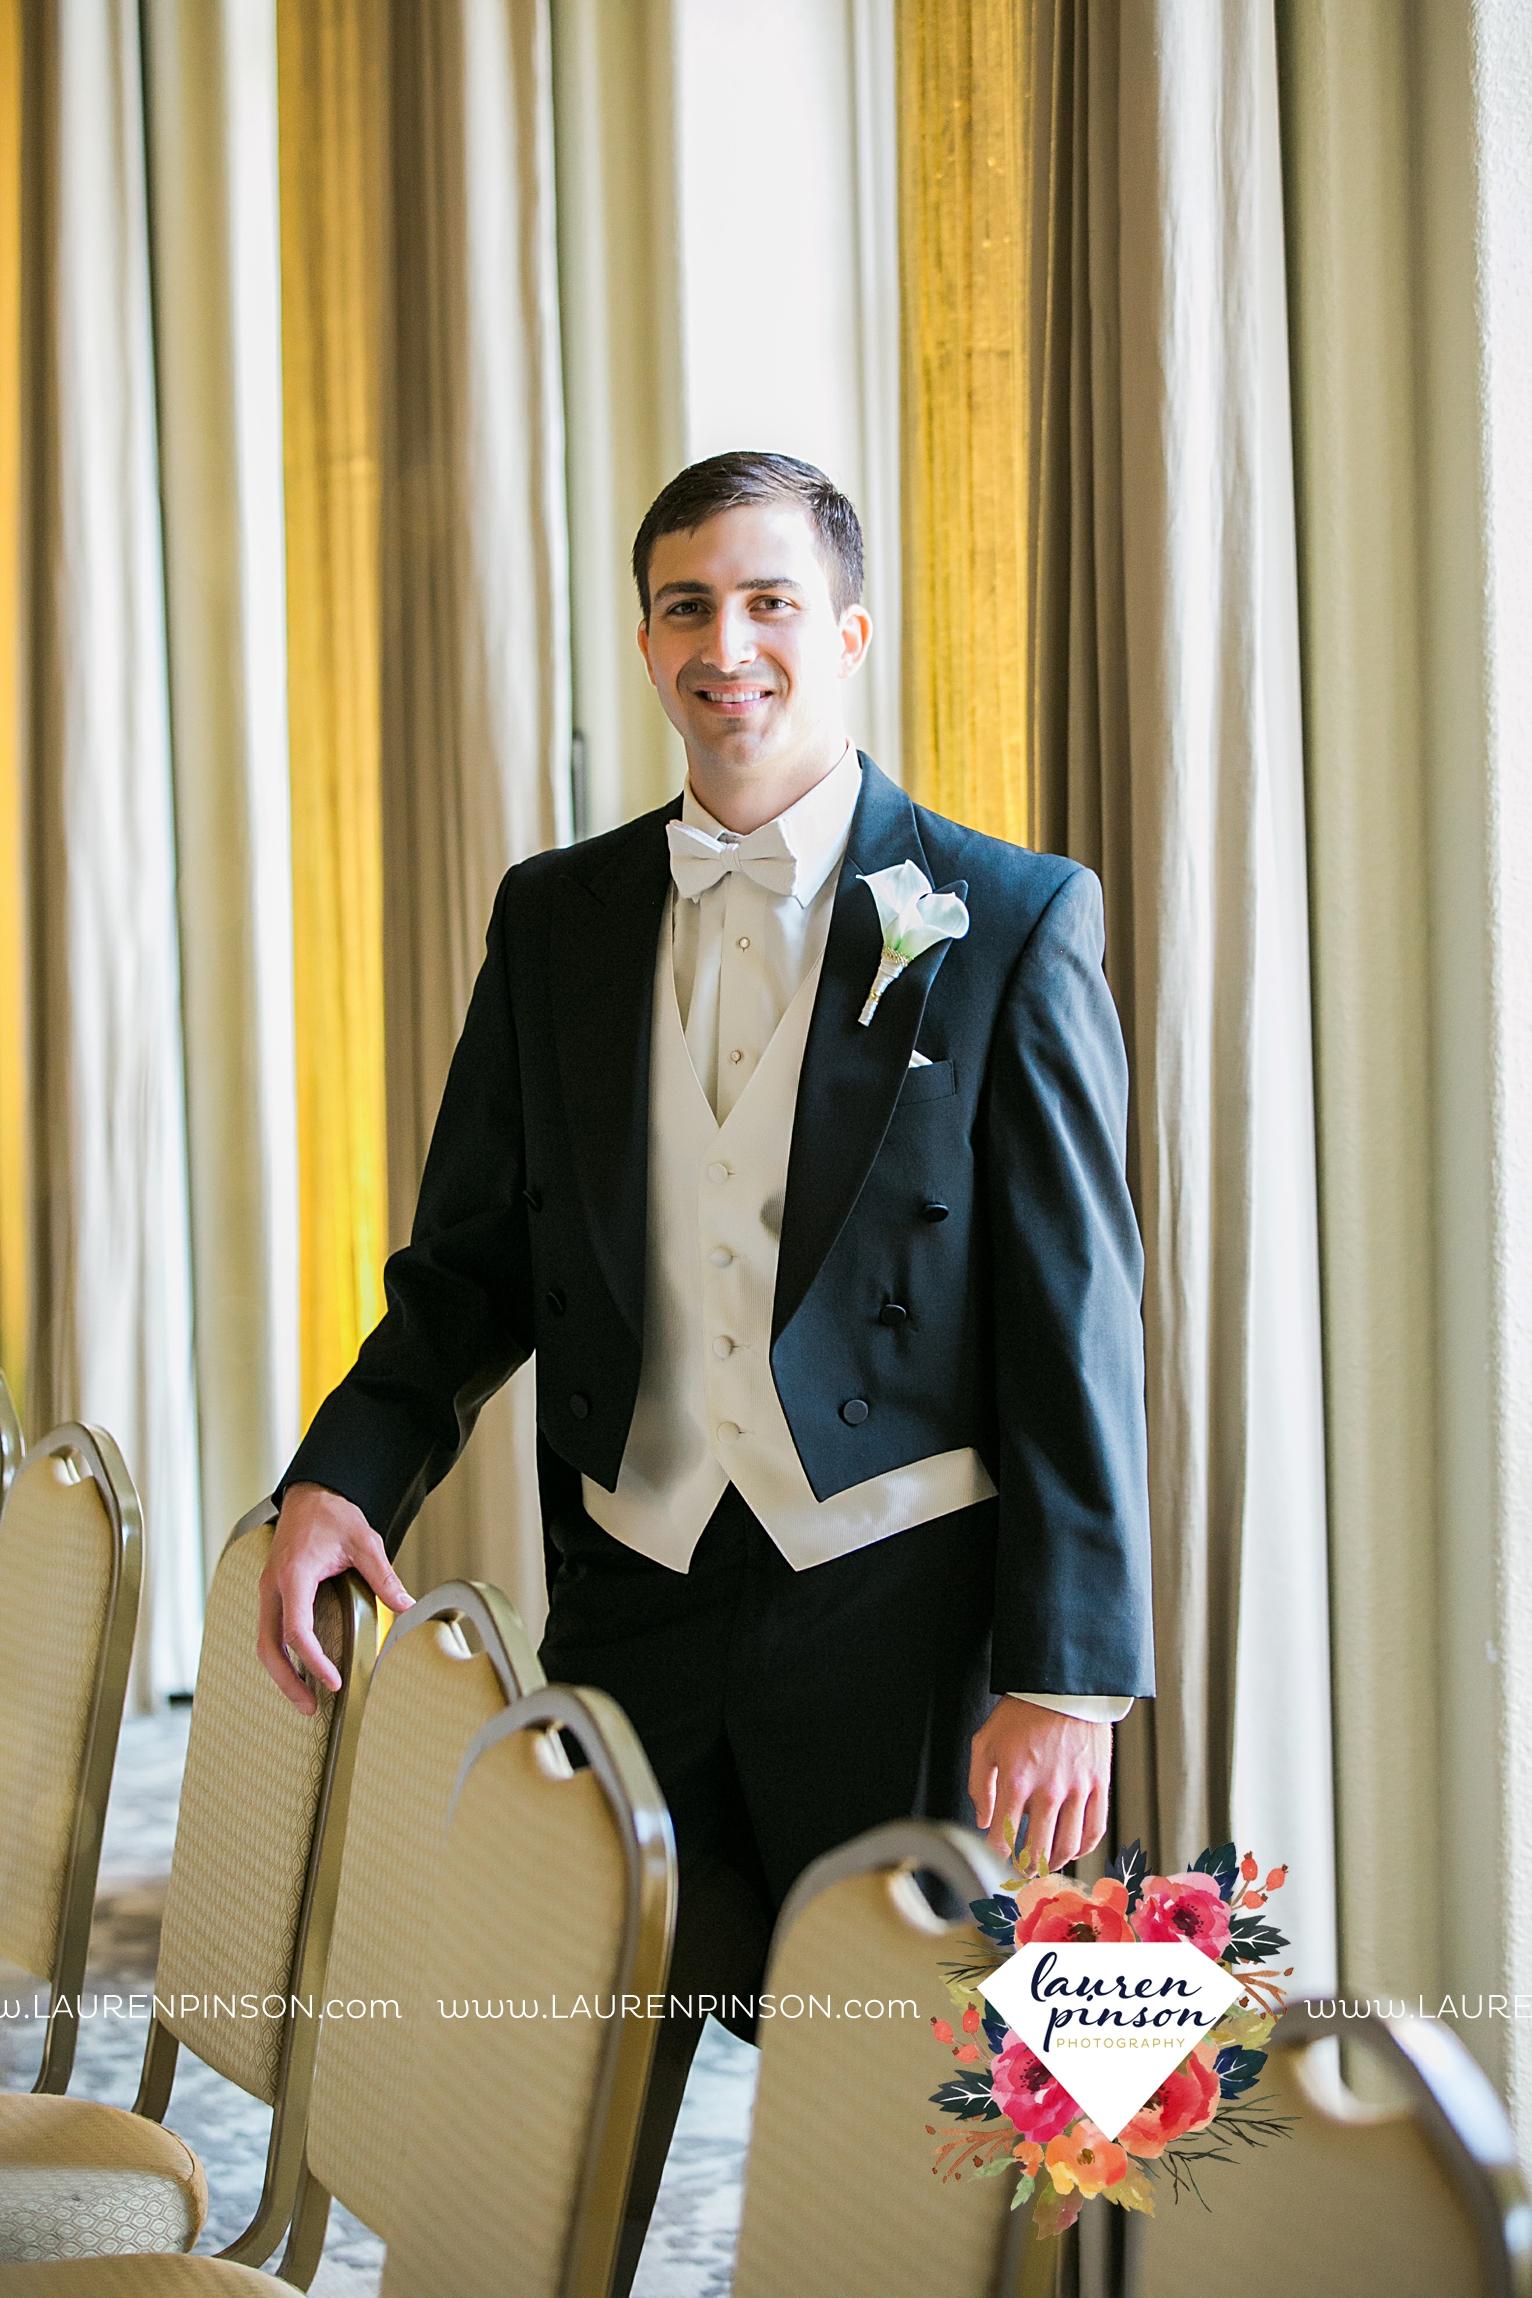 wichita-falls-texas-wedding-photographer-the-forum-by-the-kemp-mayfield-events-ulta-gold-glitter_2819.jpg